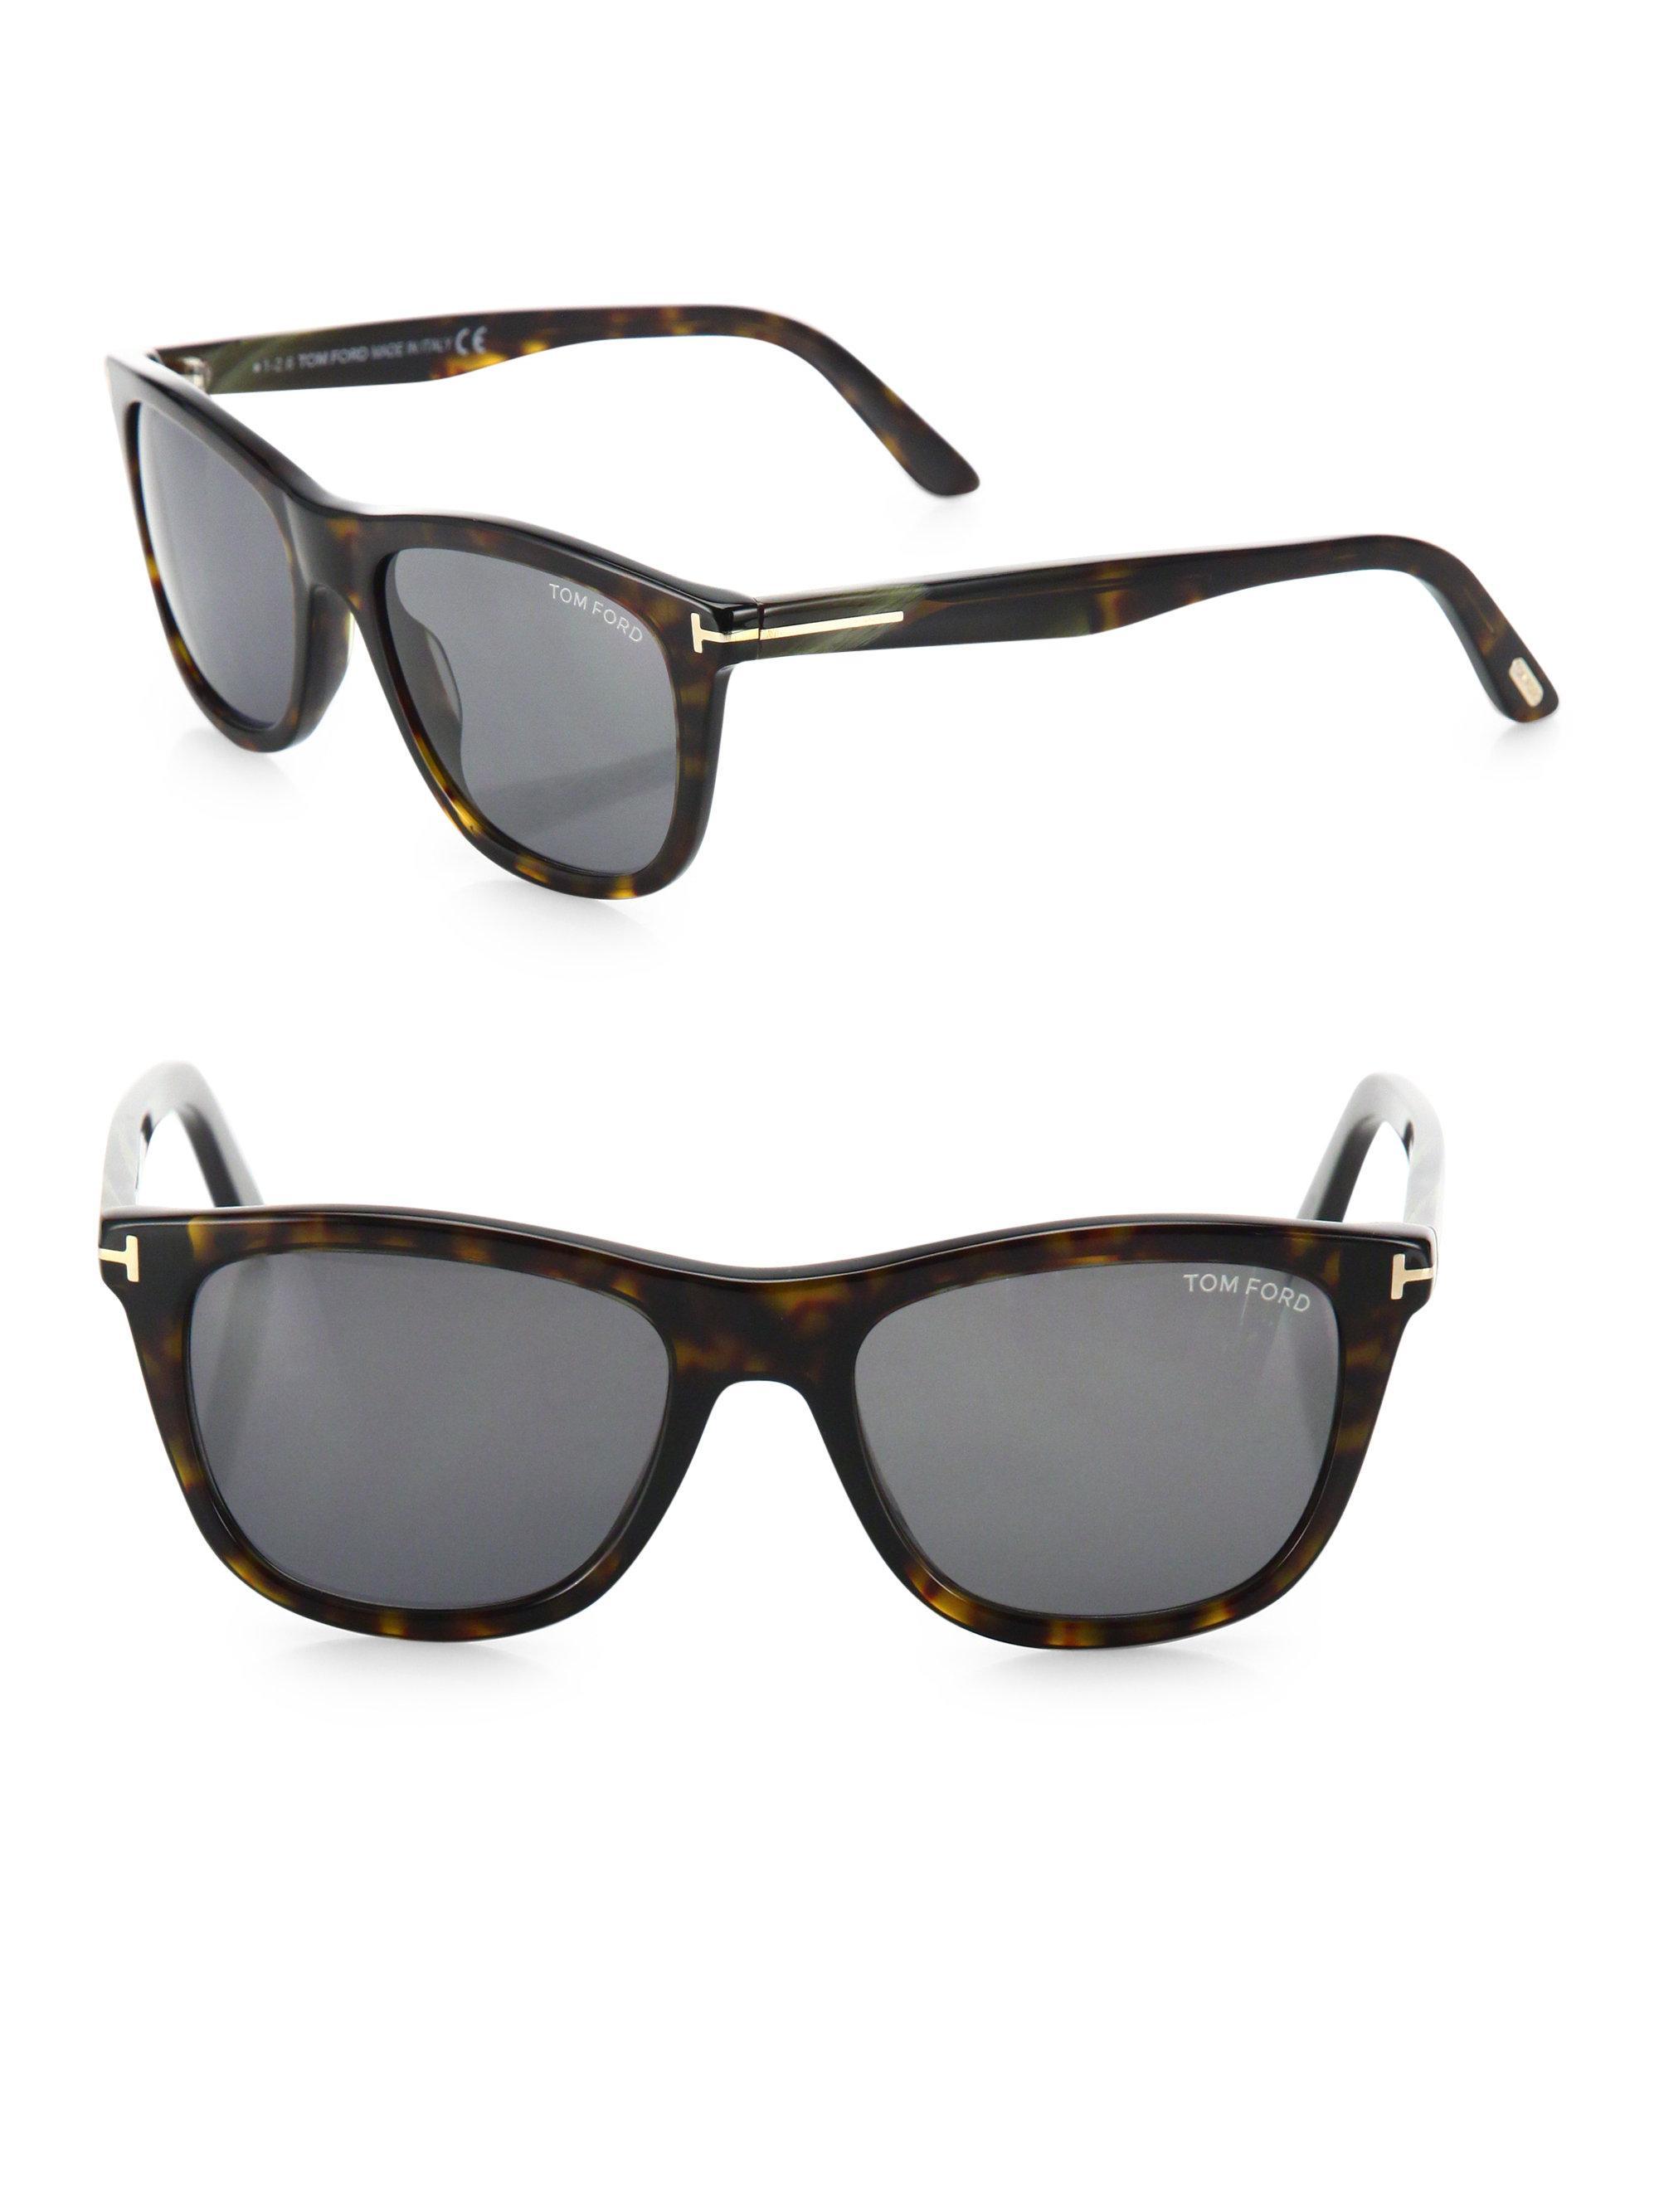 a867c3650ee Tom Ford - Black Andrew 54mm Square Sunglasses for Men - Lyst. View  fullscreen